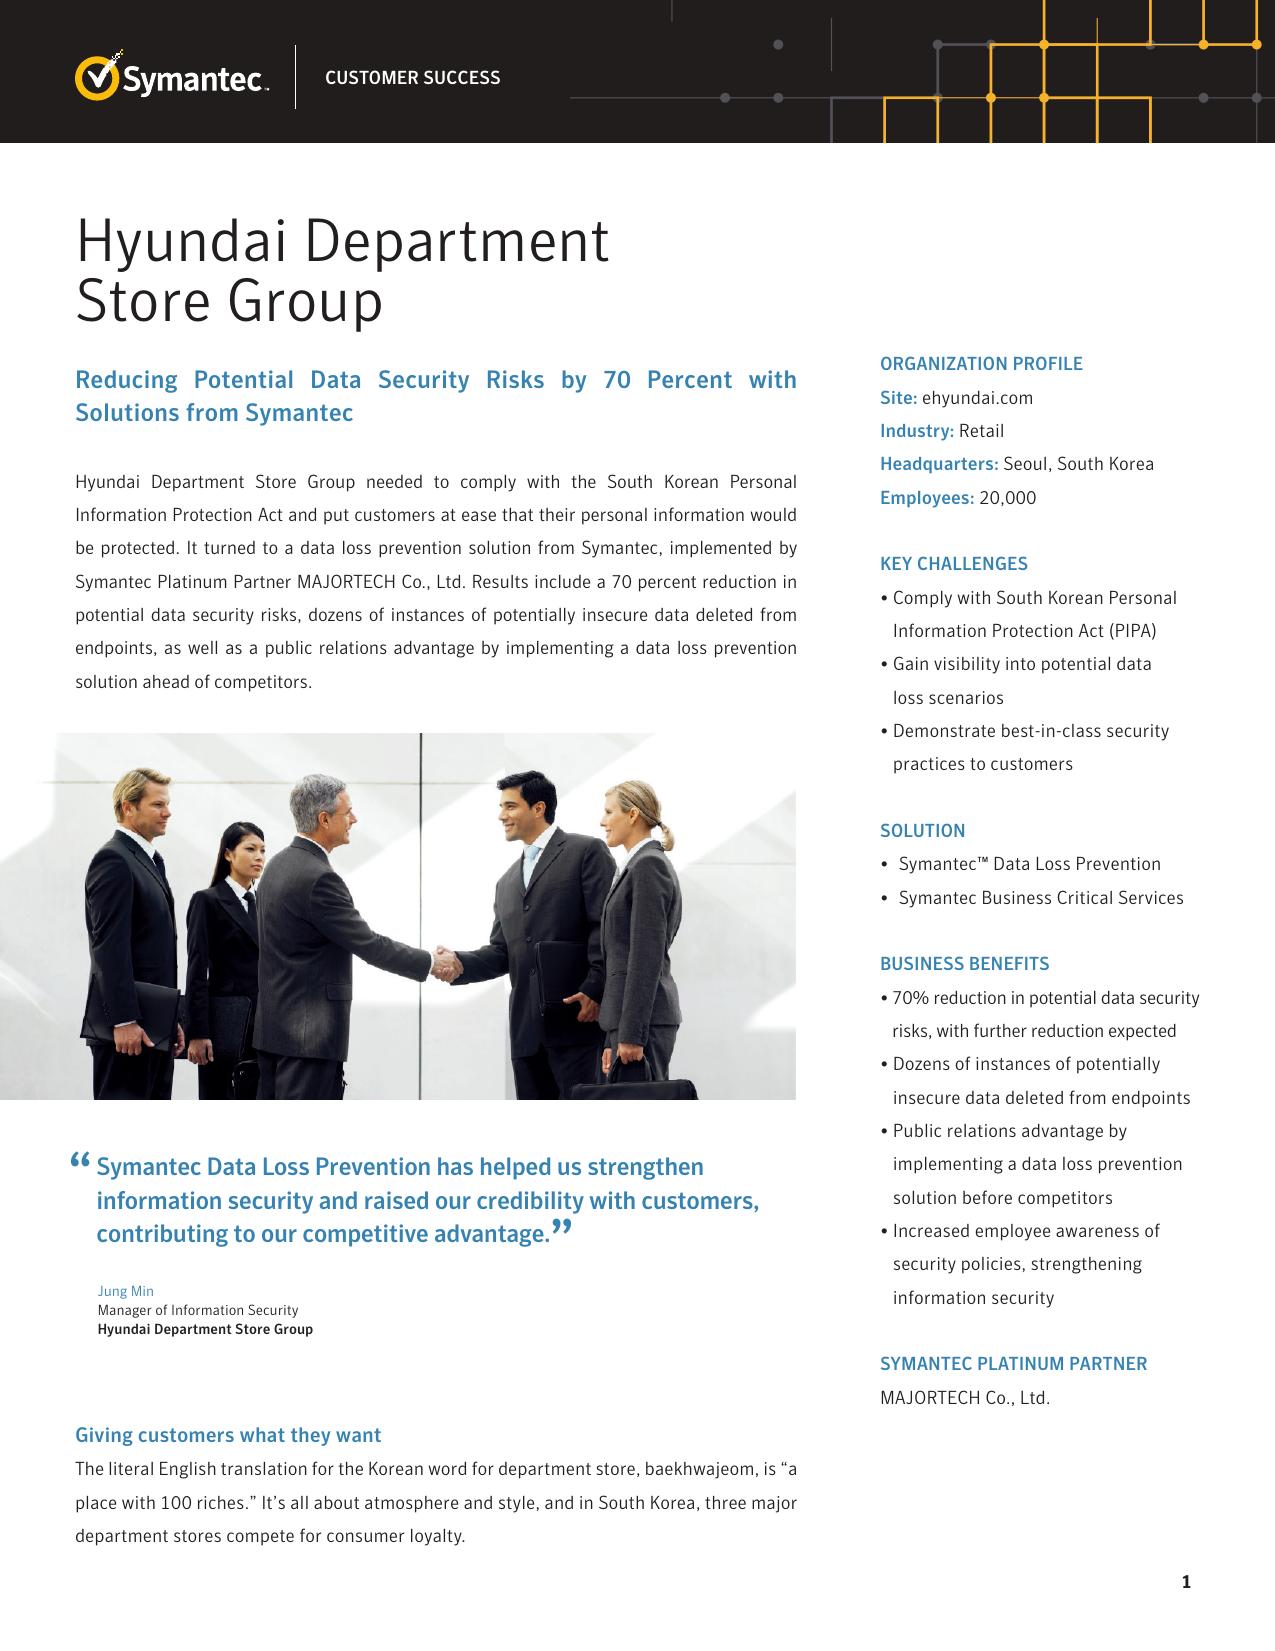 Hyundai Department Store Group